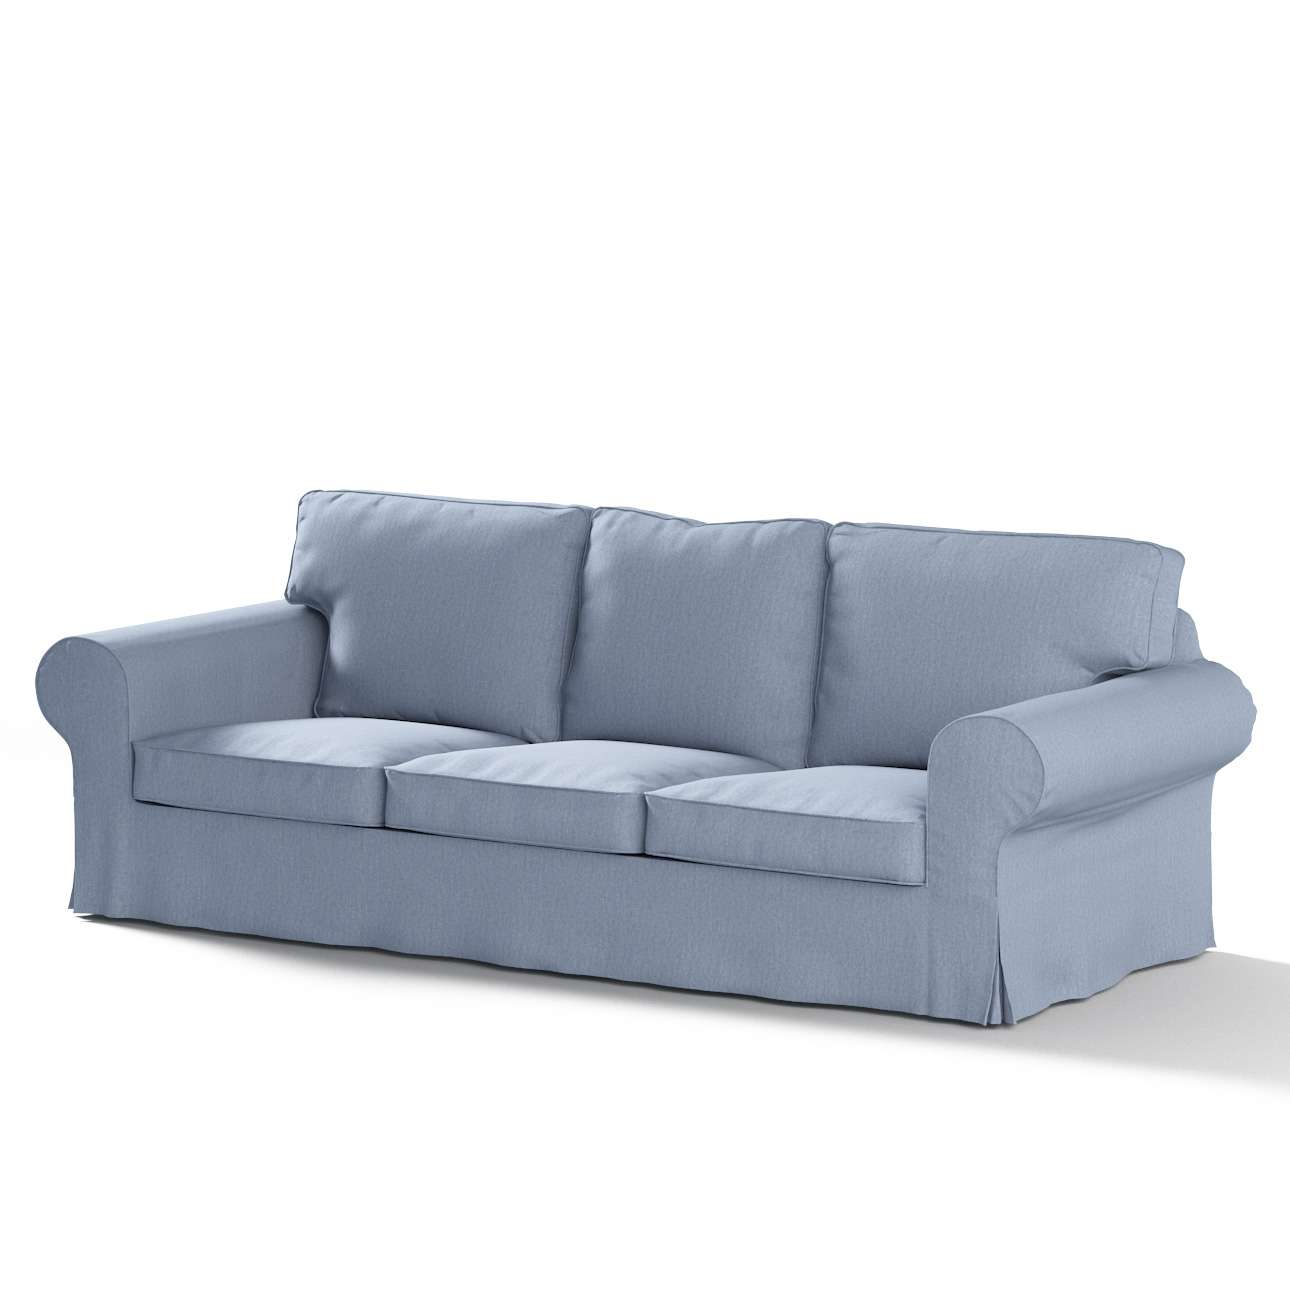 Ektorp 2 5 Zits Slaapbank.Ektorp 3 Seater Sofa Cover Light Blue Chenille 702 13 Ektorp 3